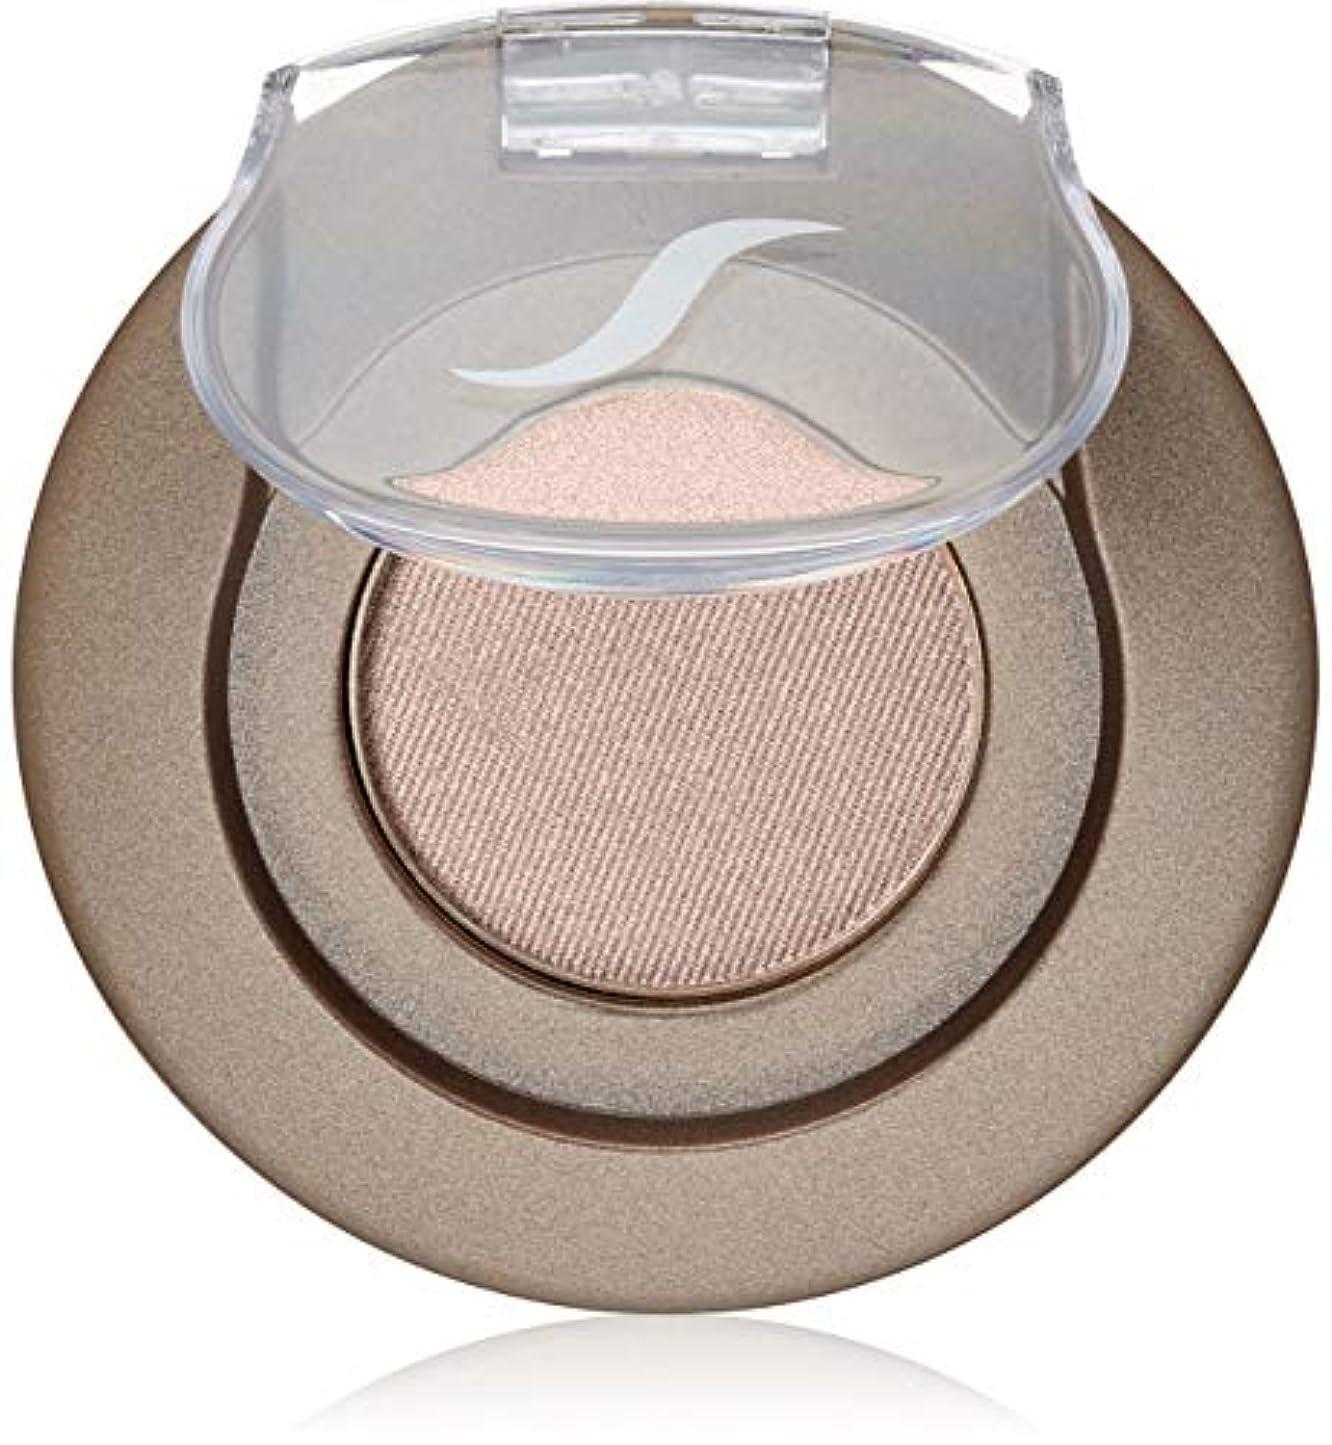 Sorme' Treatment Cosmetics Sorme化粧品ミネラルボタニカルアイシャドー、0.05オンス 0.05オンス フラッシュ